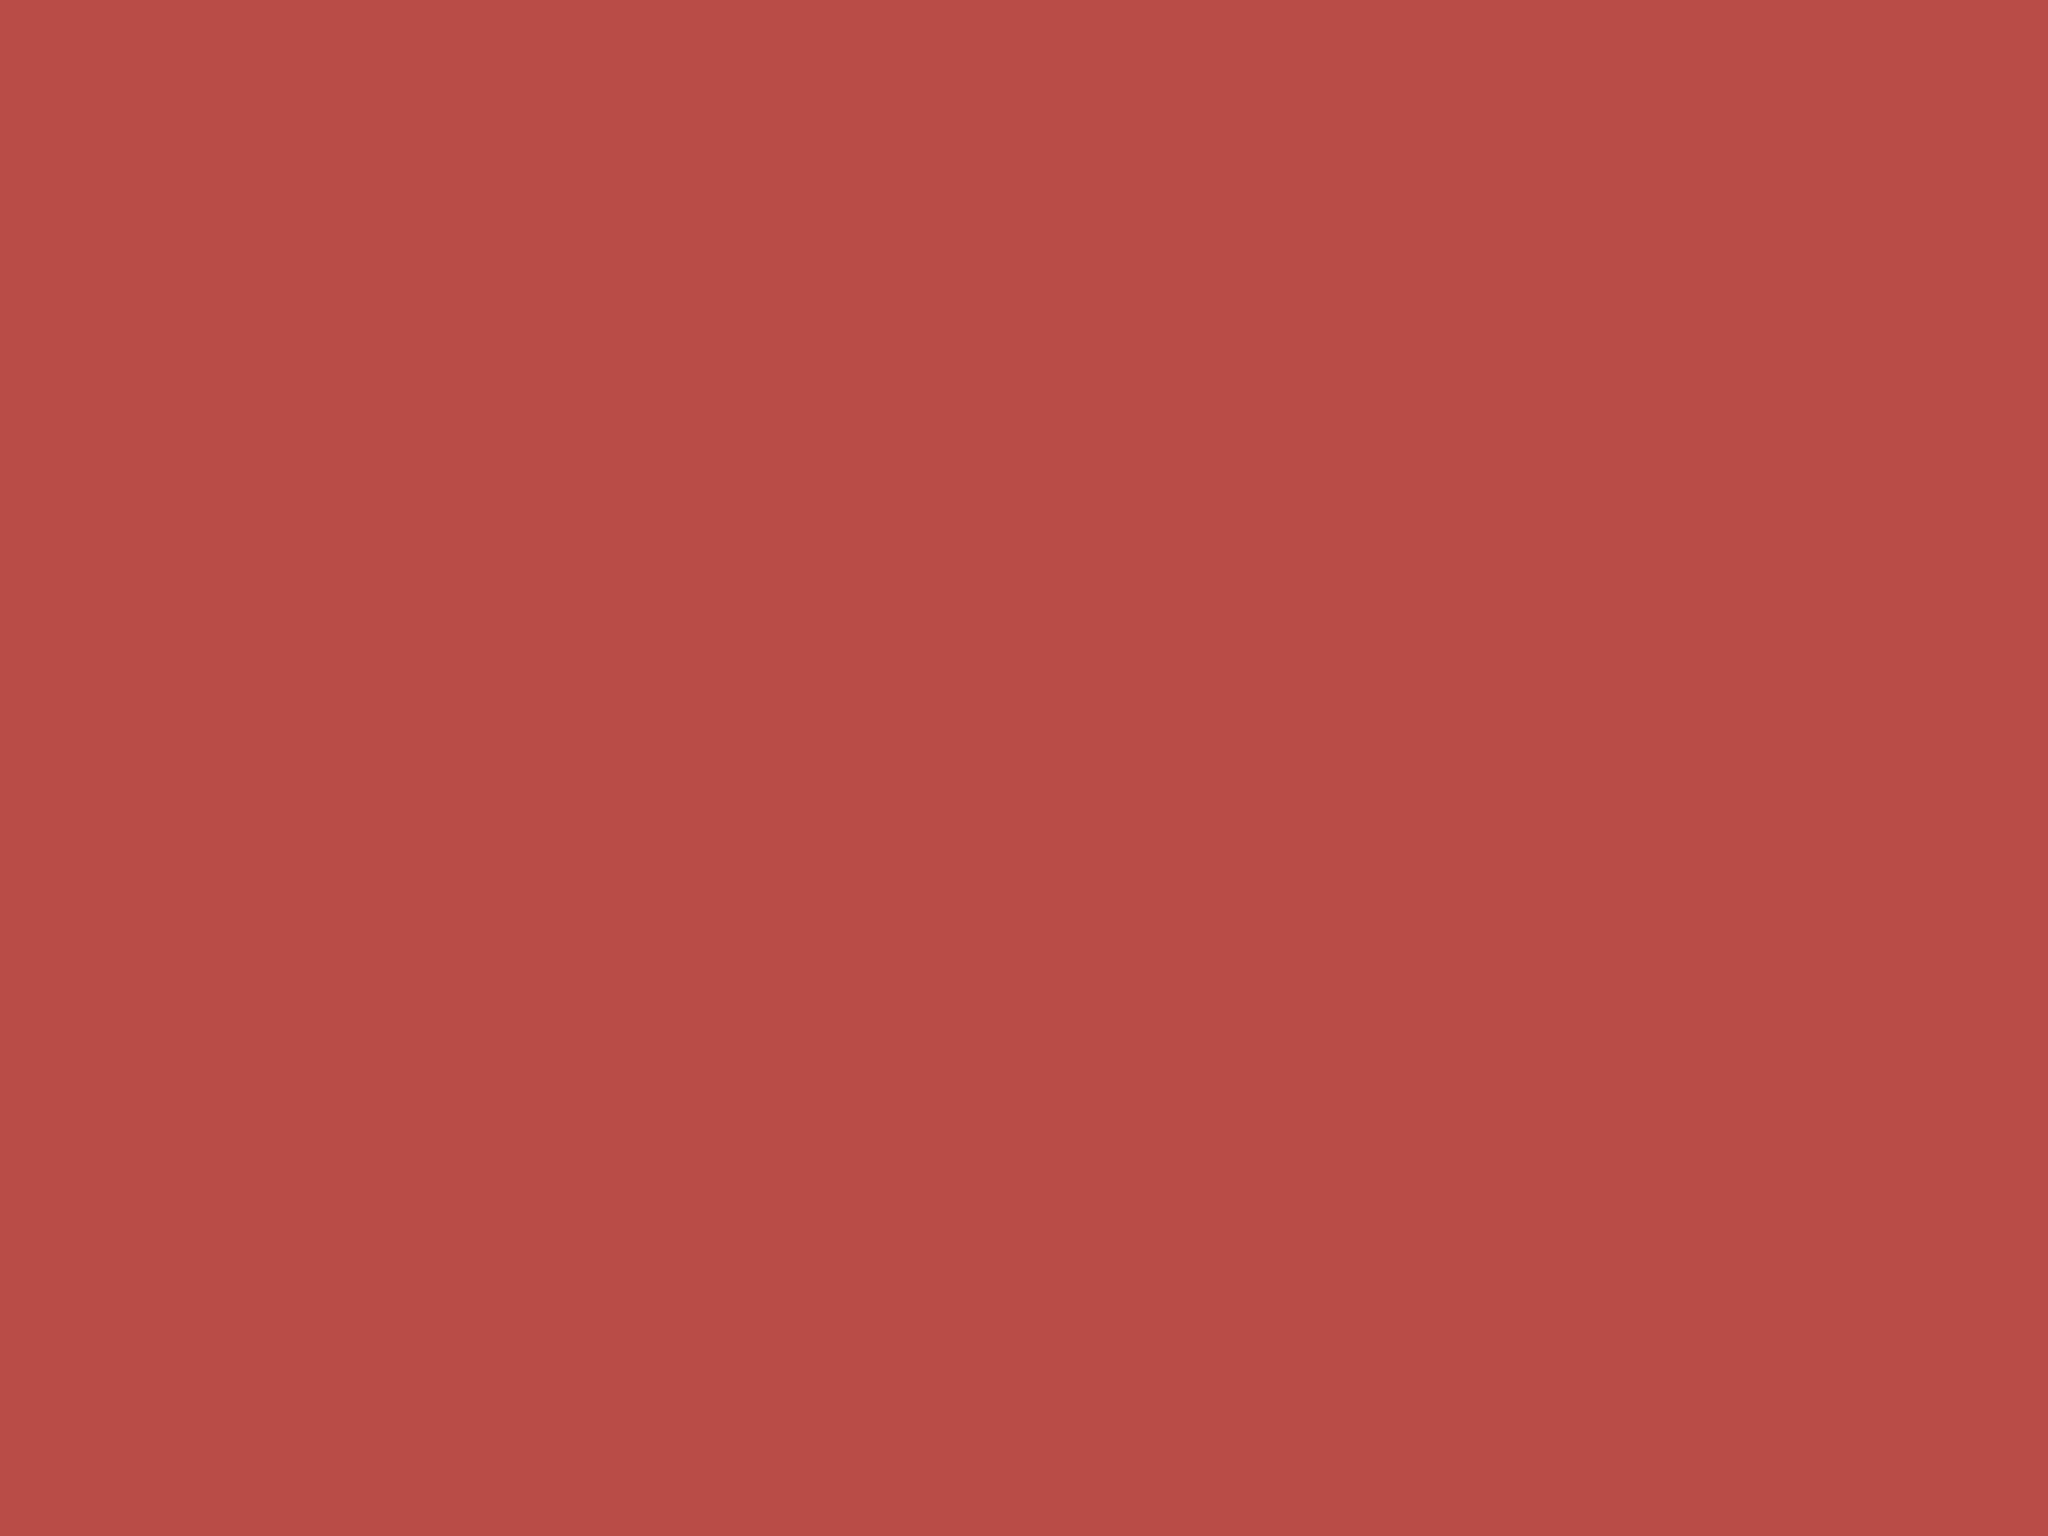 2048x1536 Deep Chestnut Solid Color Background